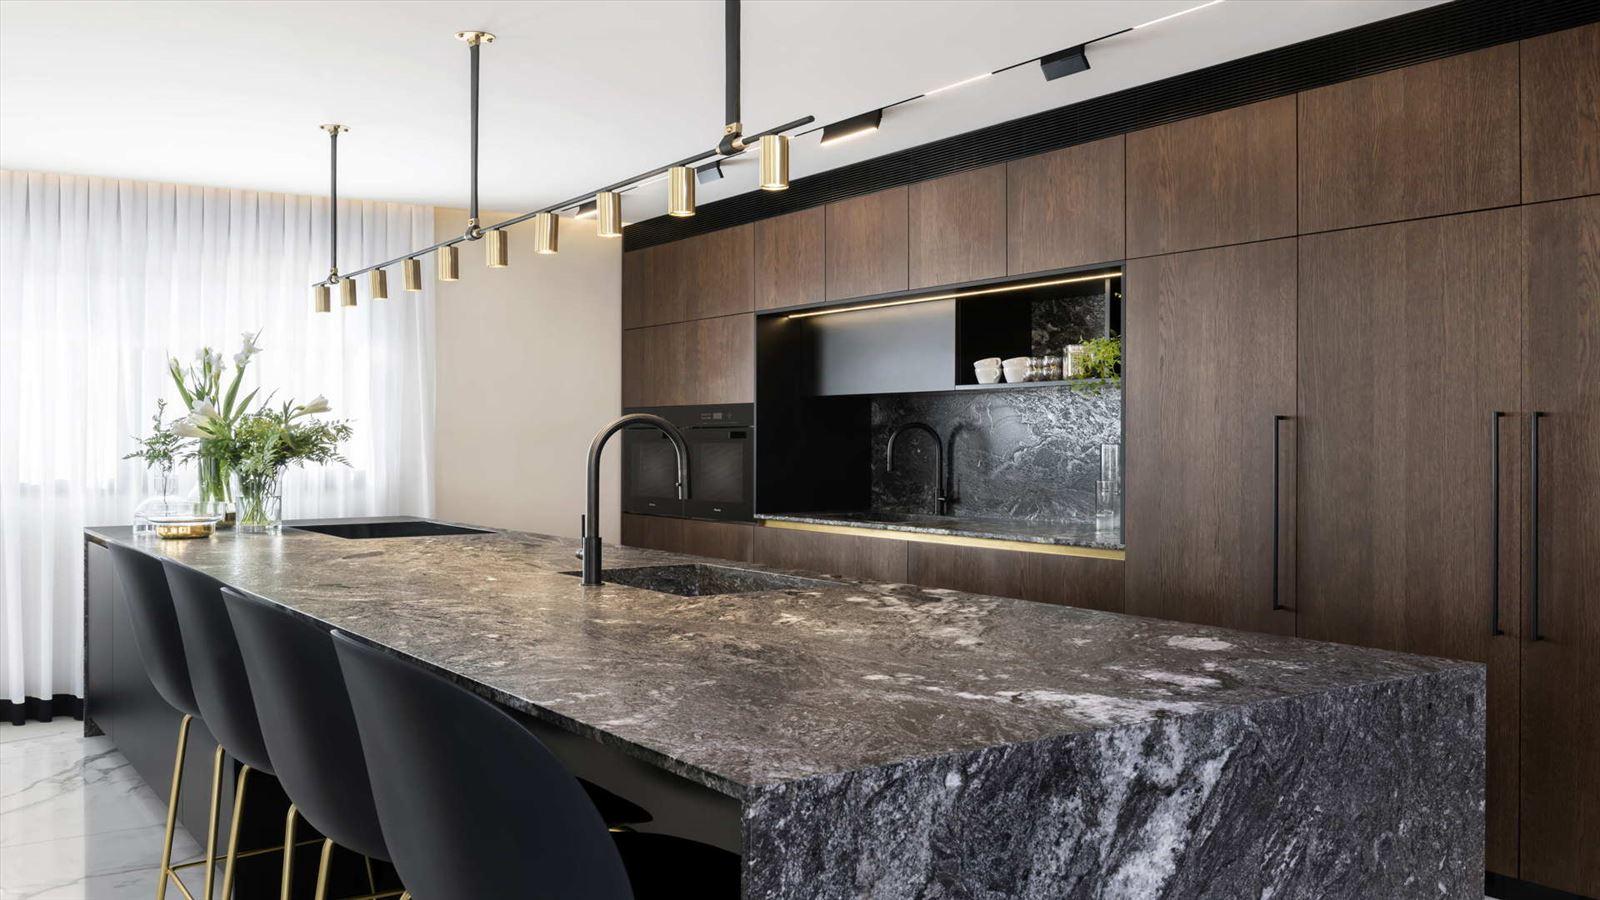 HOUSE Between The Mountains התאורה במטבח על ידי קמחי תאורה